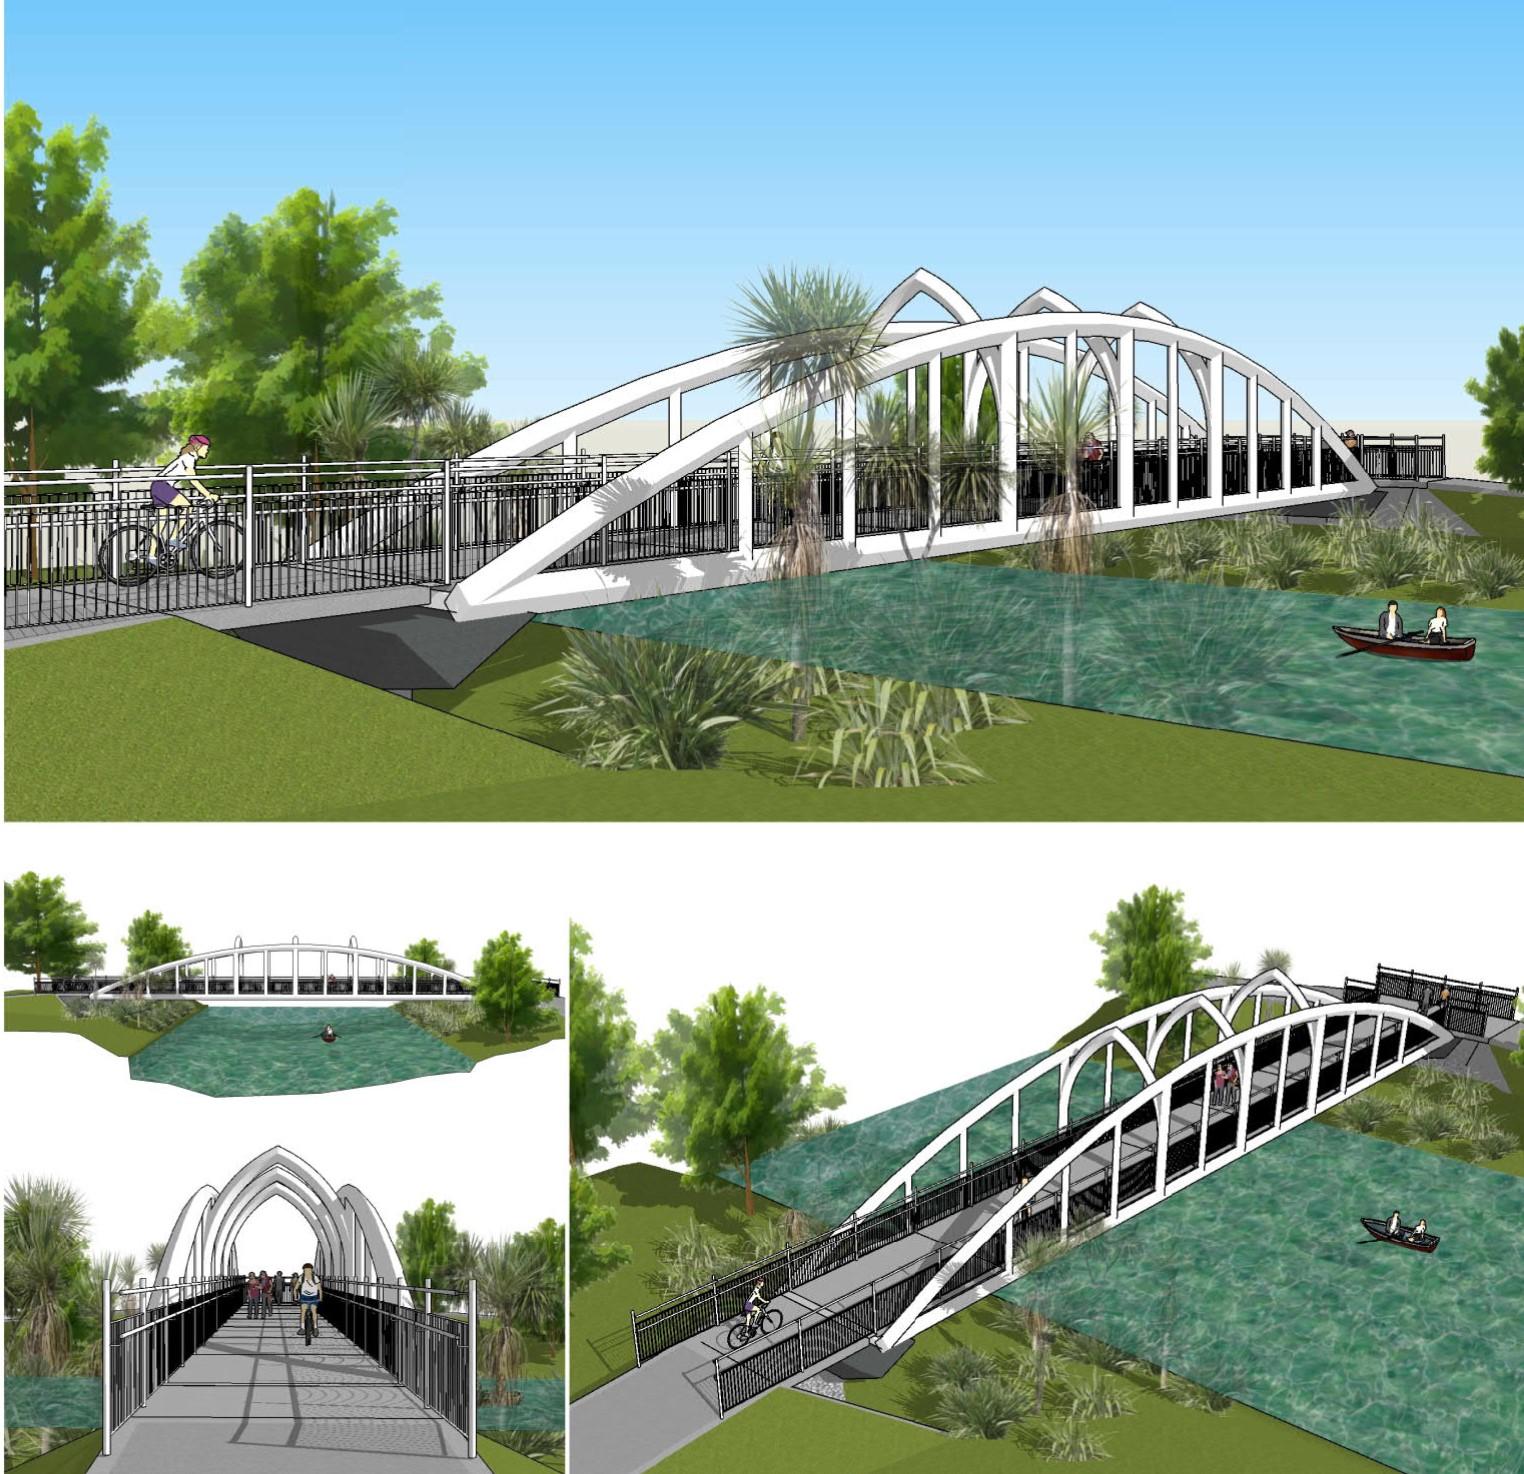 Artist impression of Snell bridge